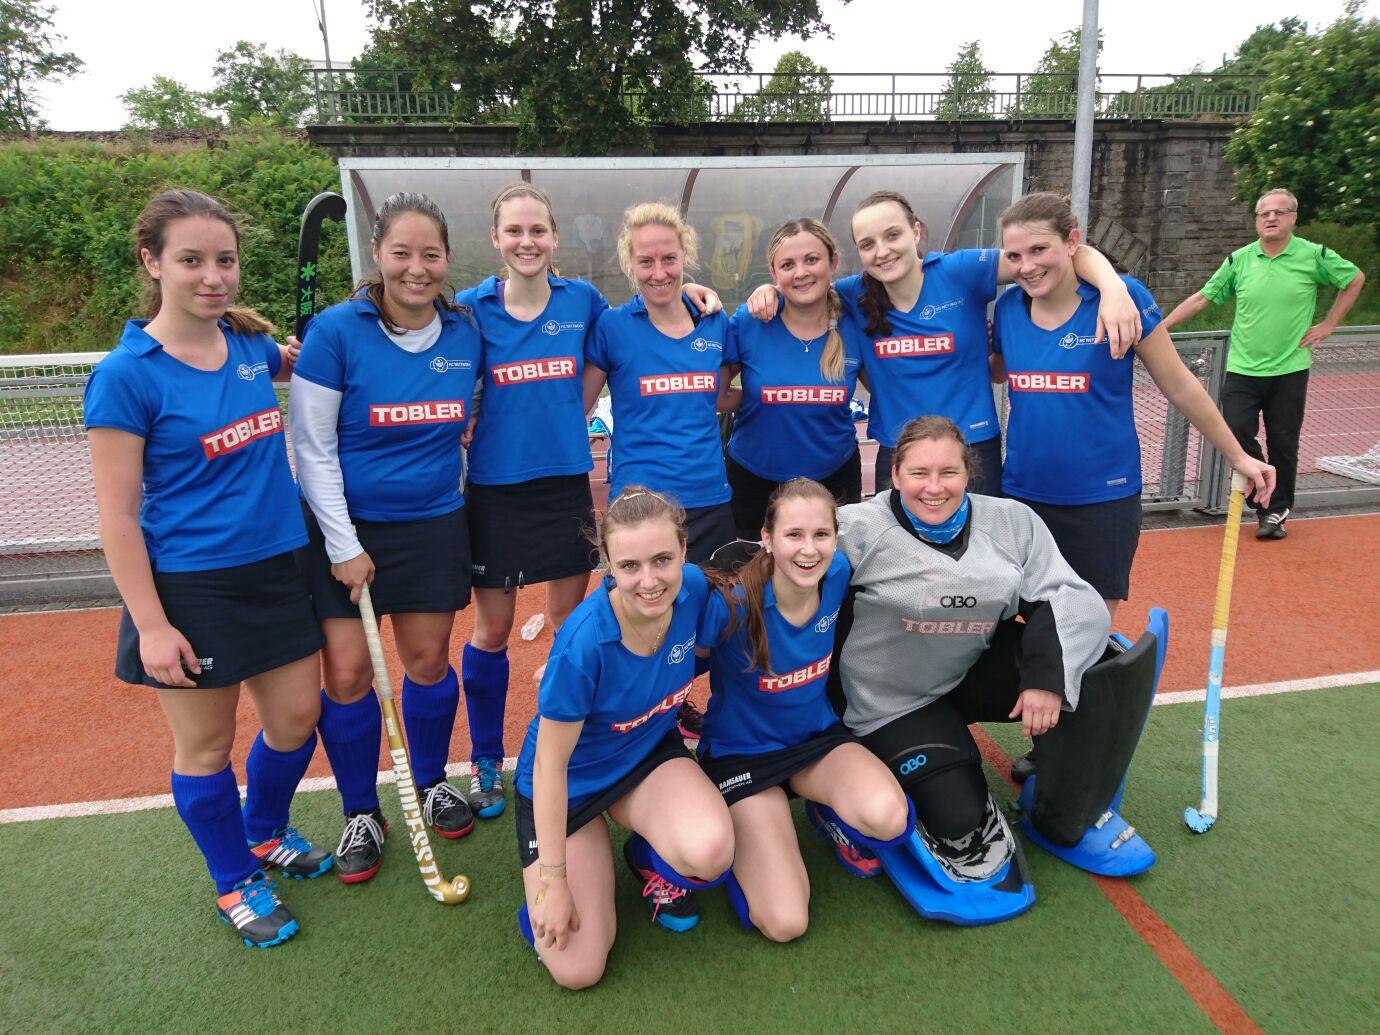 Damen Saison 2015/16